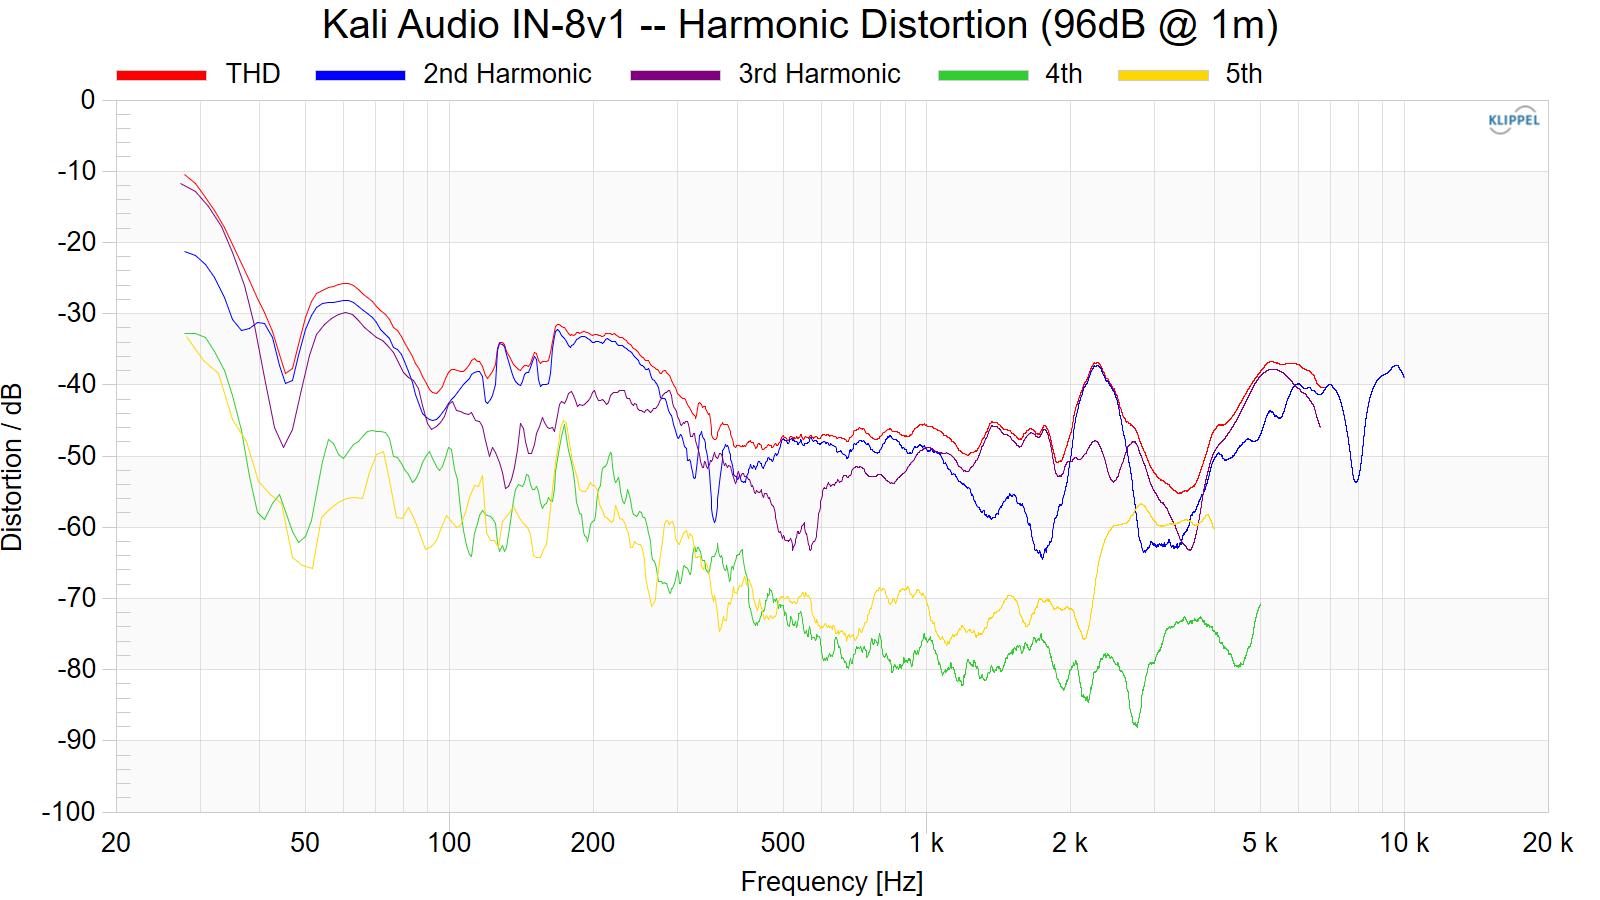 Kali%20Audio%20IN-8v1%20--%20Harmonic%20Distortion%20%2896dB%20%40%201m%29.png